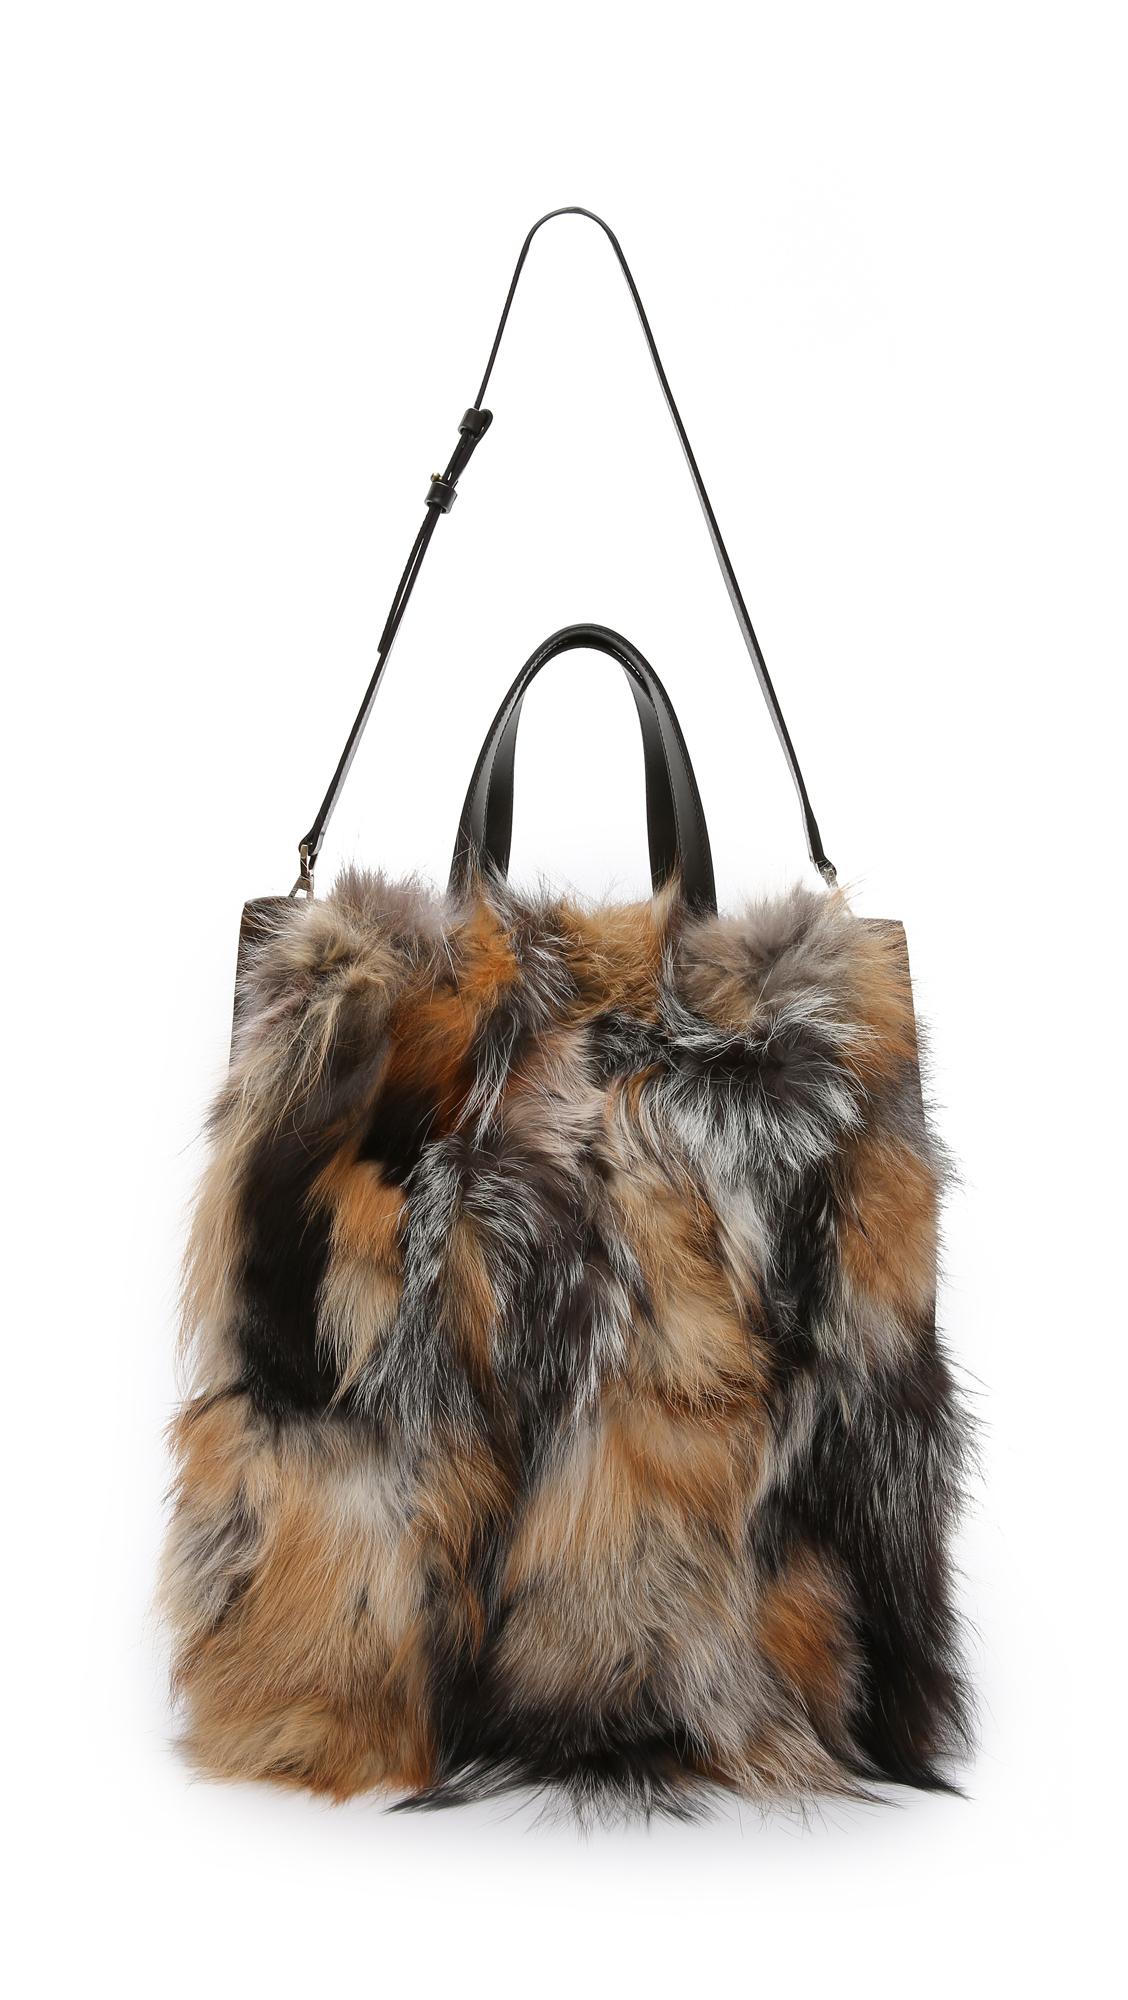 c8b6409931a4 Michael Kors Addington Xl Fur Tote - Rust in Brown - Lyst